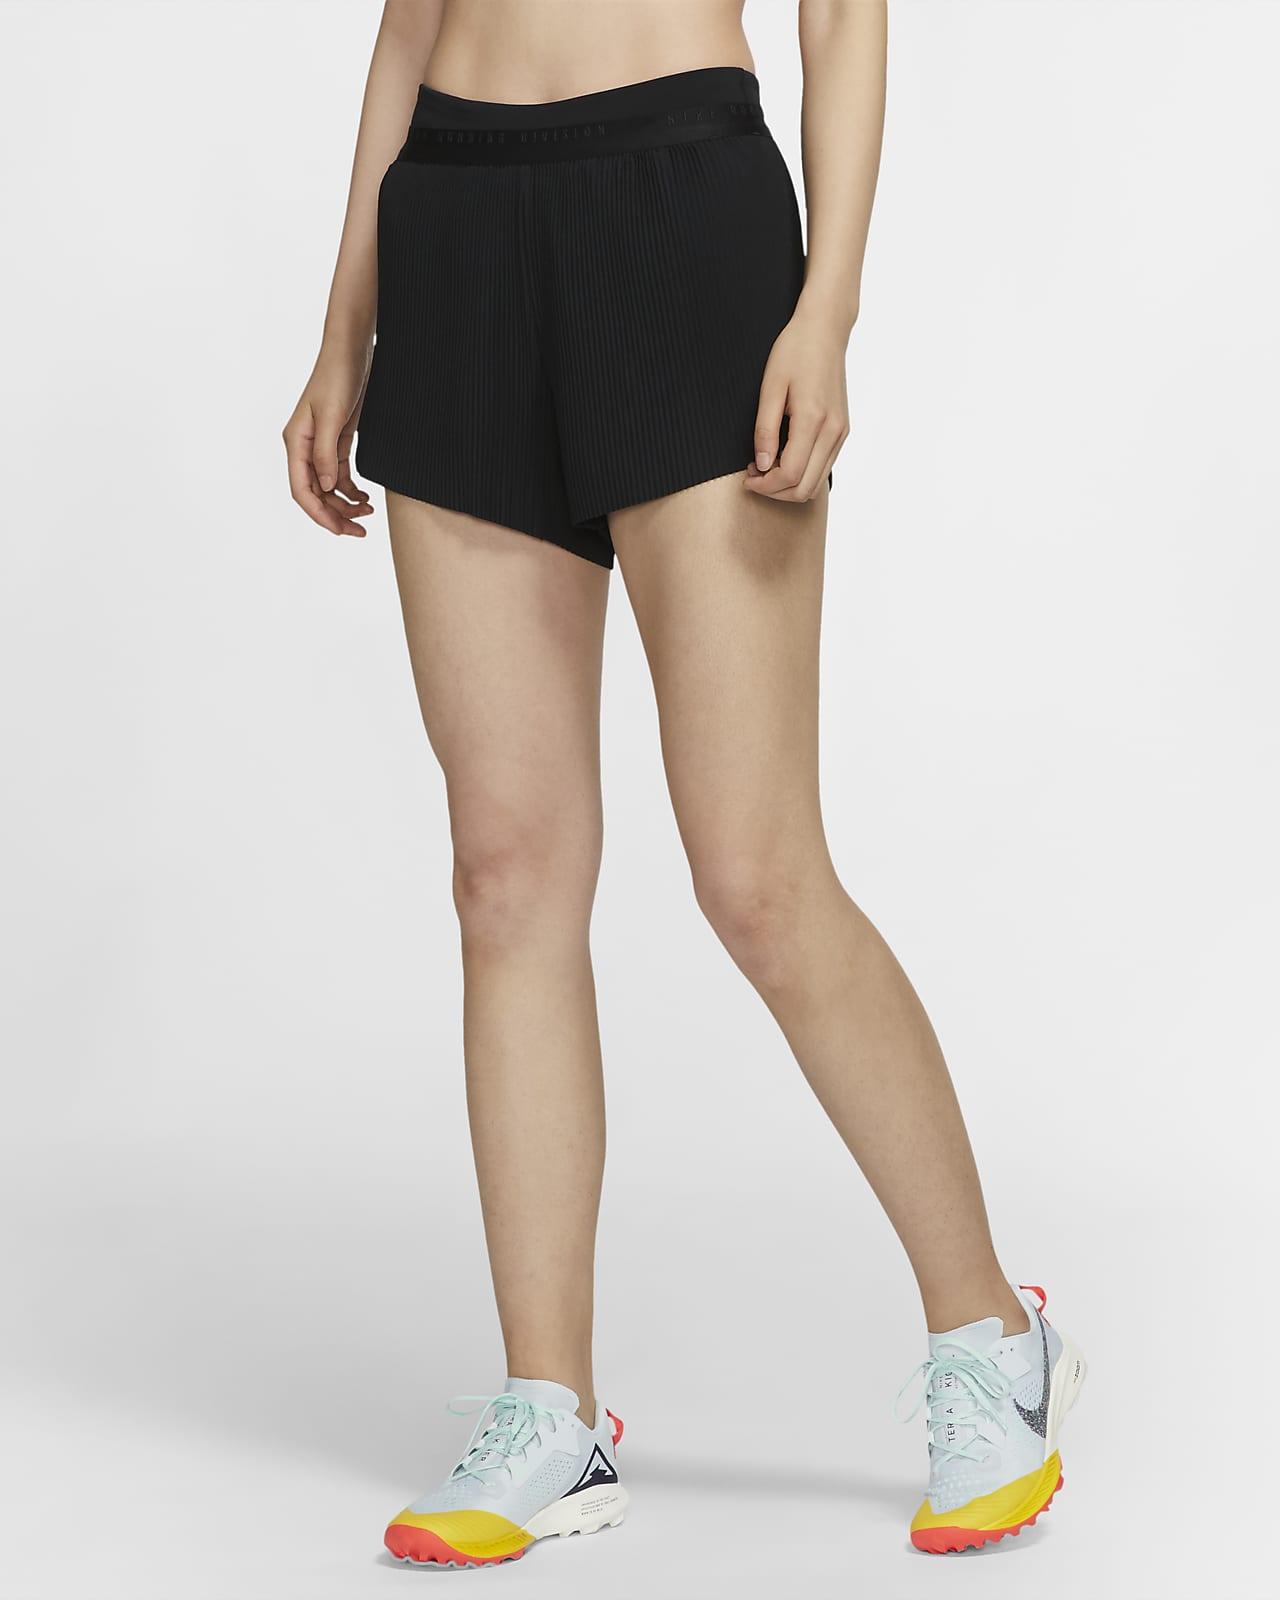 Nike Run Division Women's 3-In-1 Running Shorts